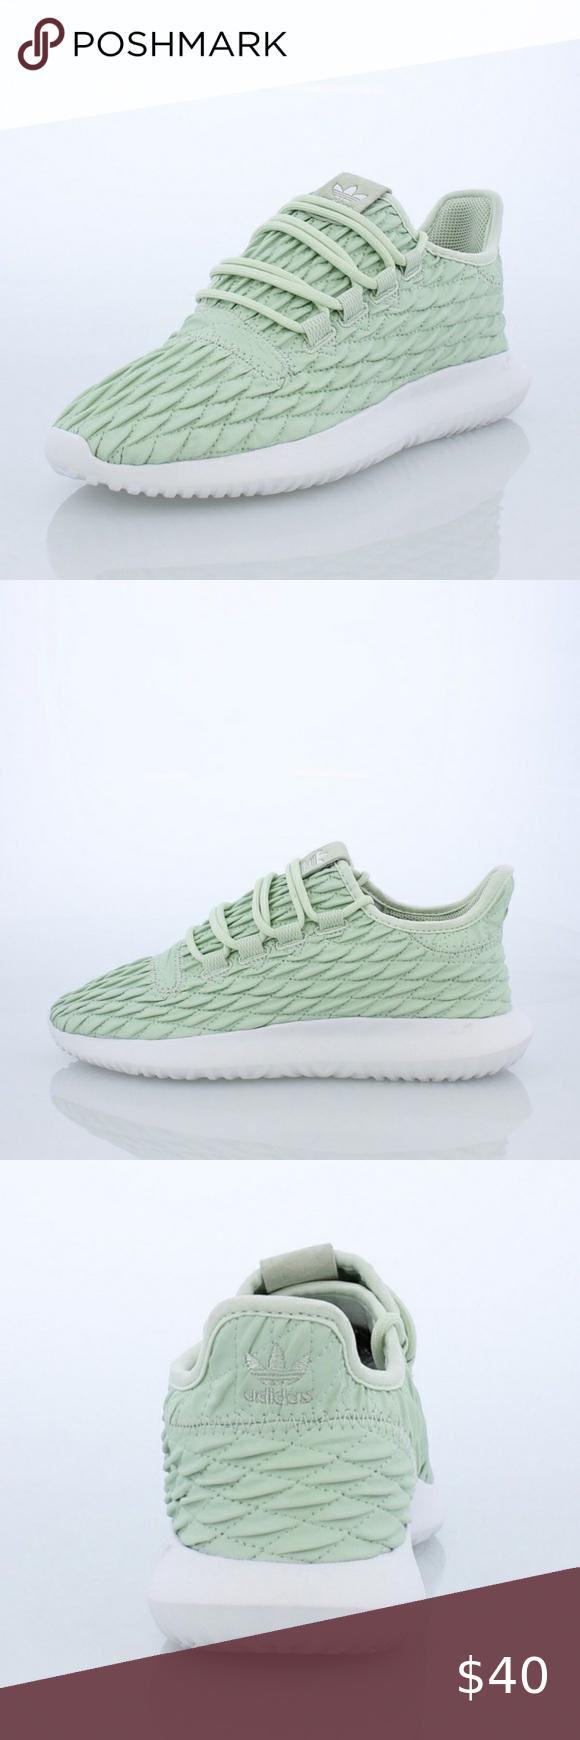 Mint Green Adidas Tubular Sneakers